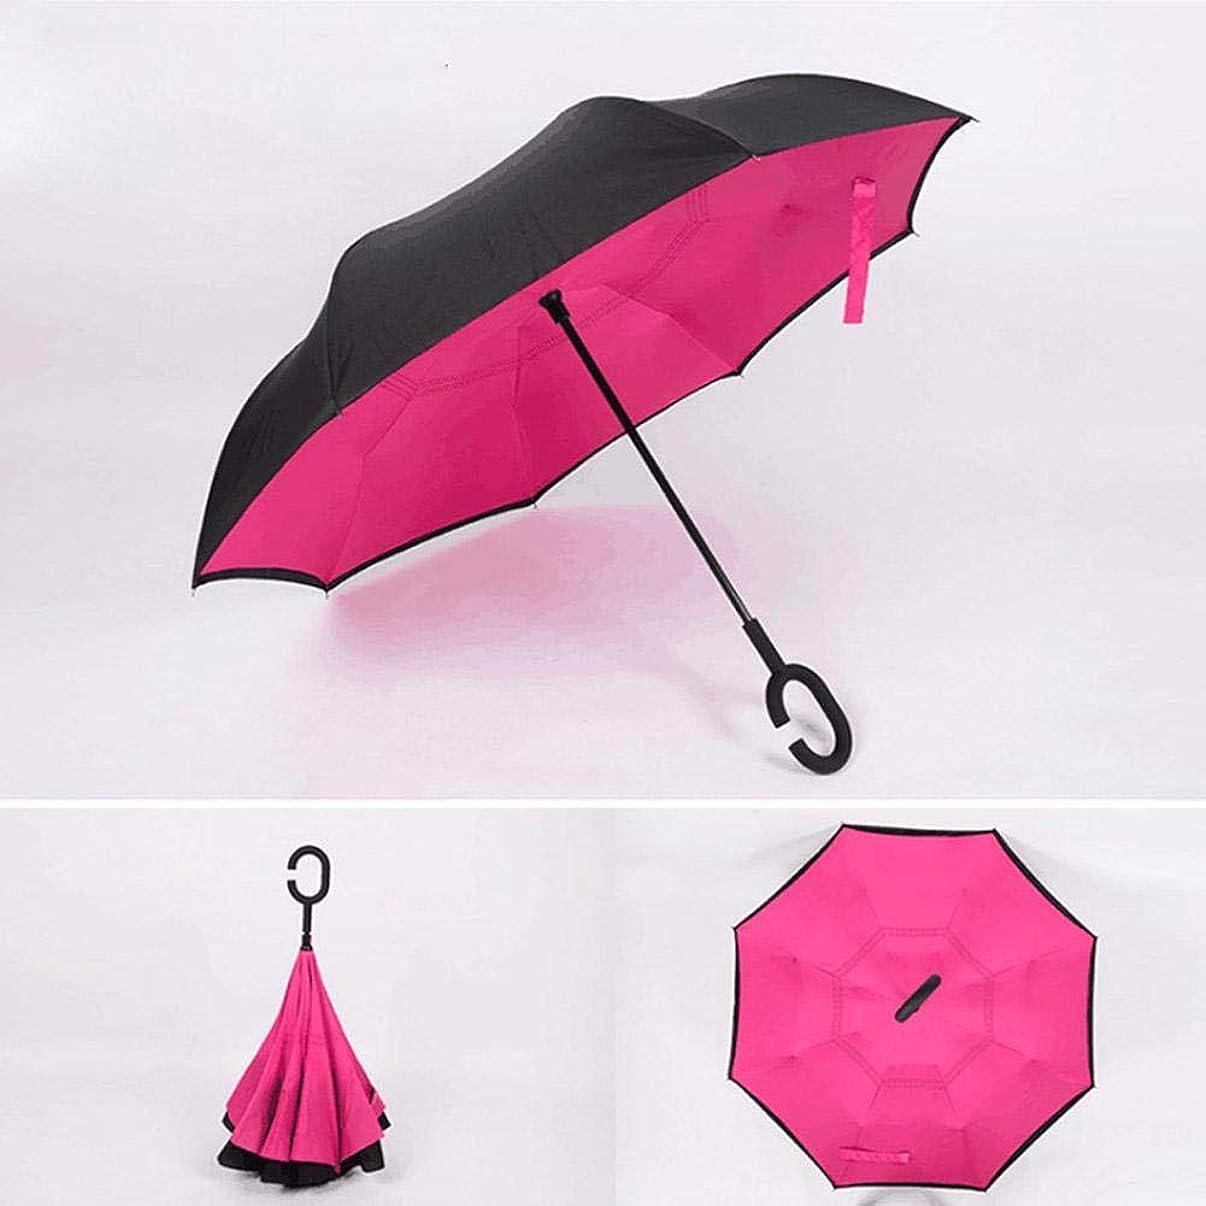 Taimot Double Layer Inverted Umbrella Folding Umbrella Windproof UV Protection Big Straight Umbrella with C-Shaped Handle for Car Rain Outdoor Use